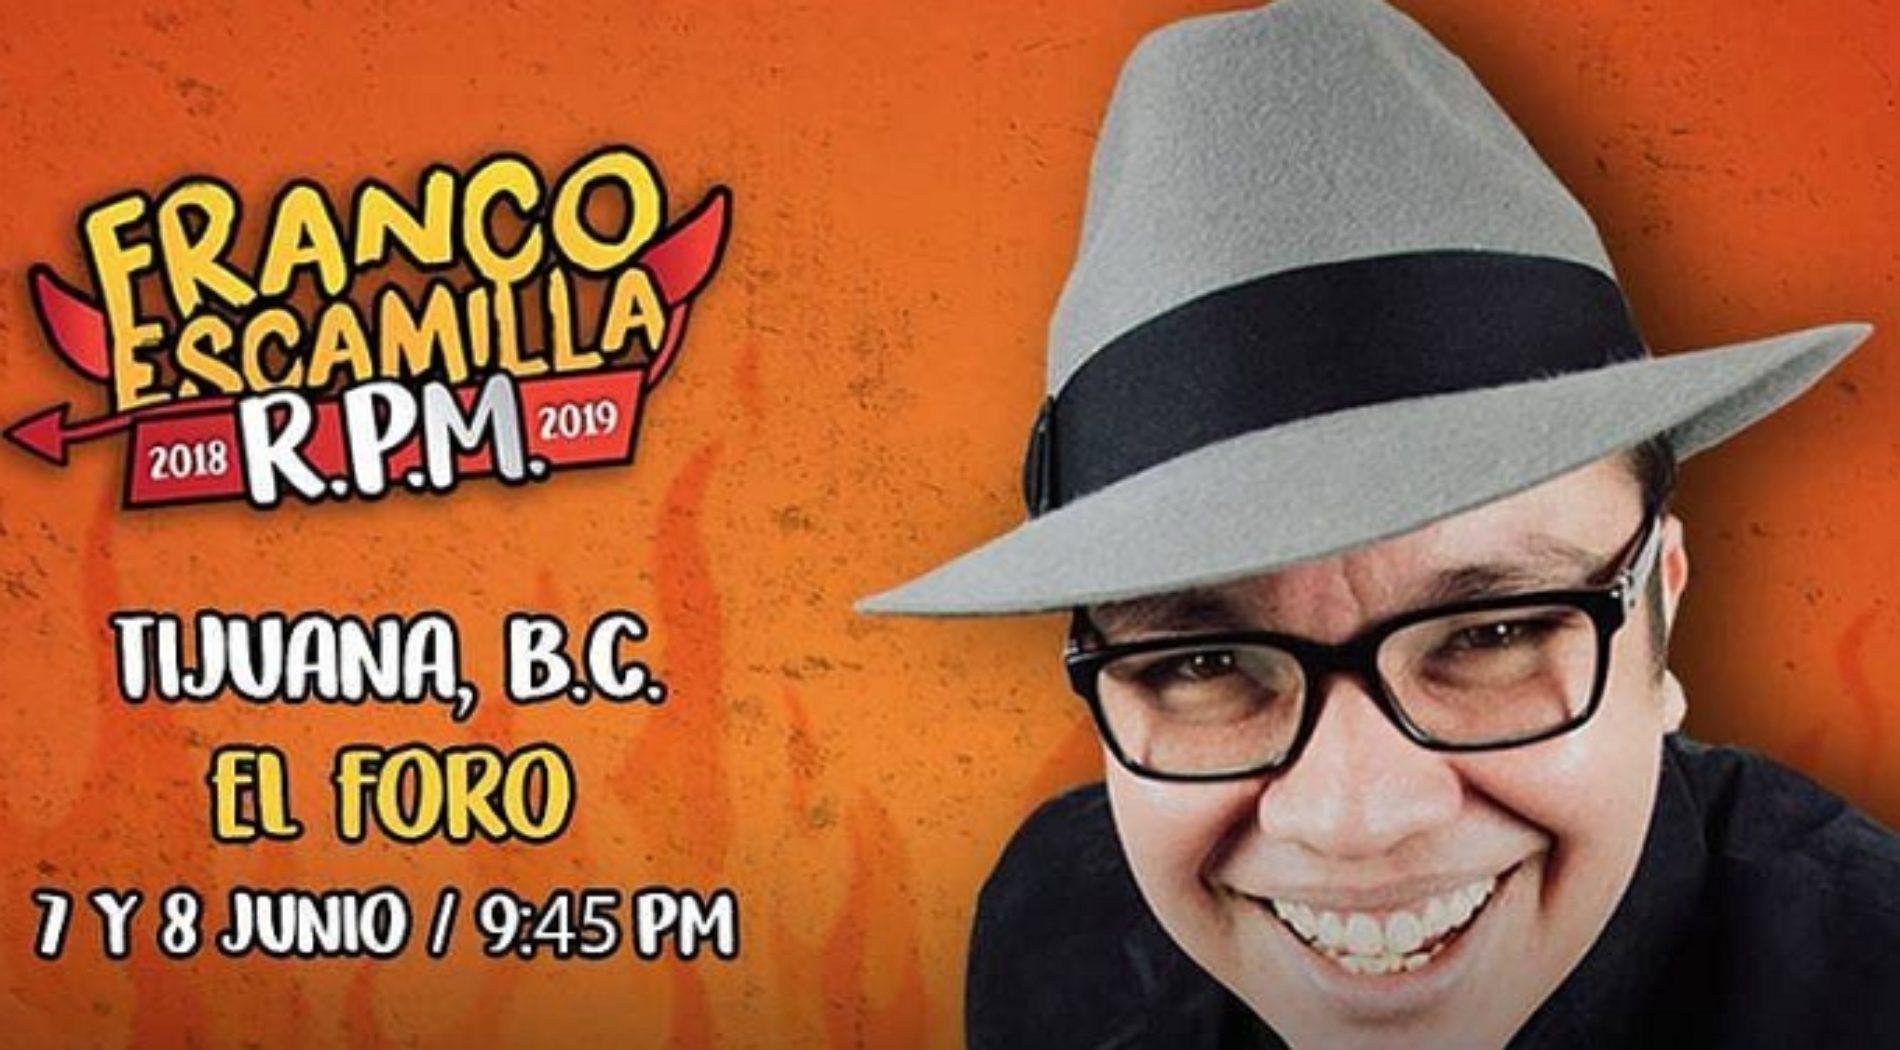 Franco Escamilla Tijuana 2018